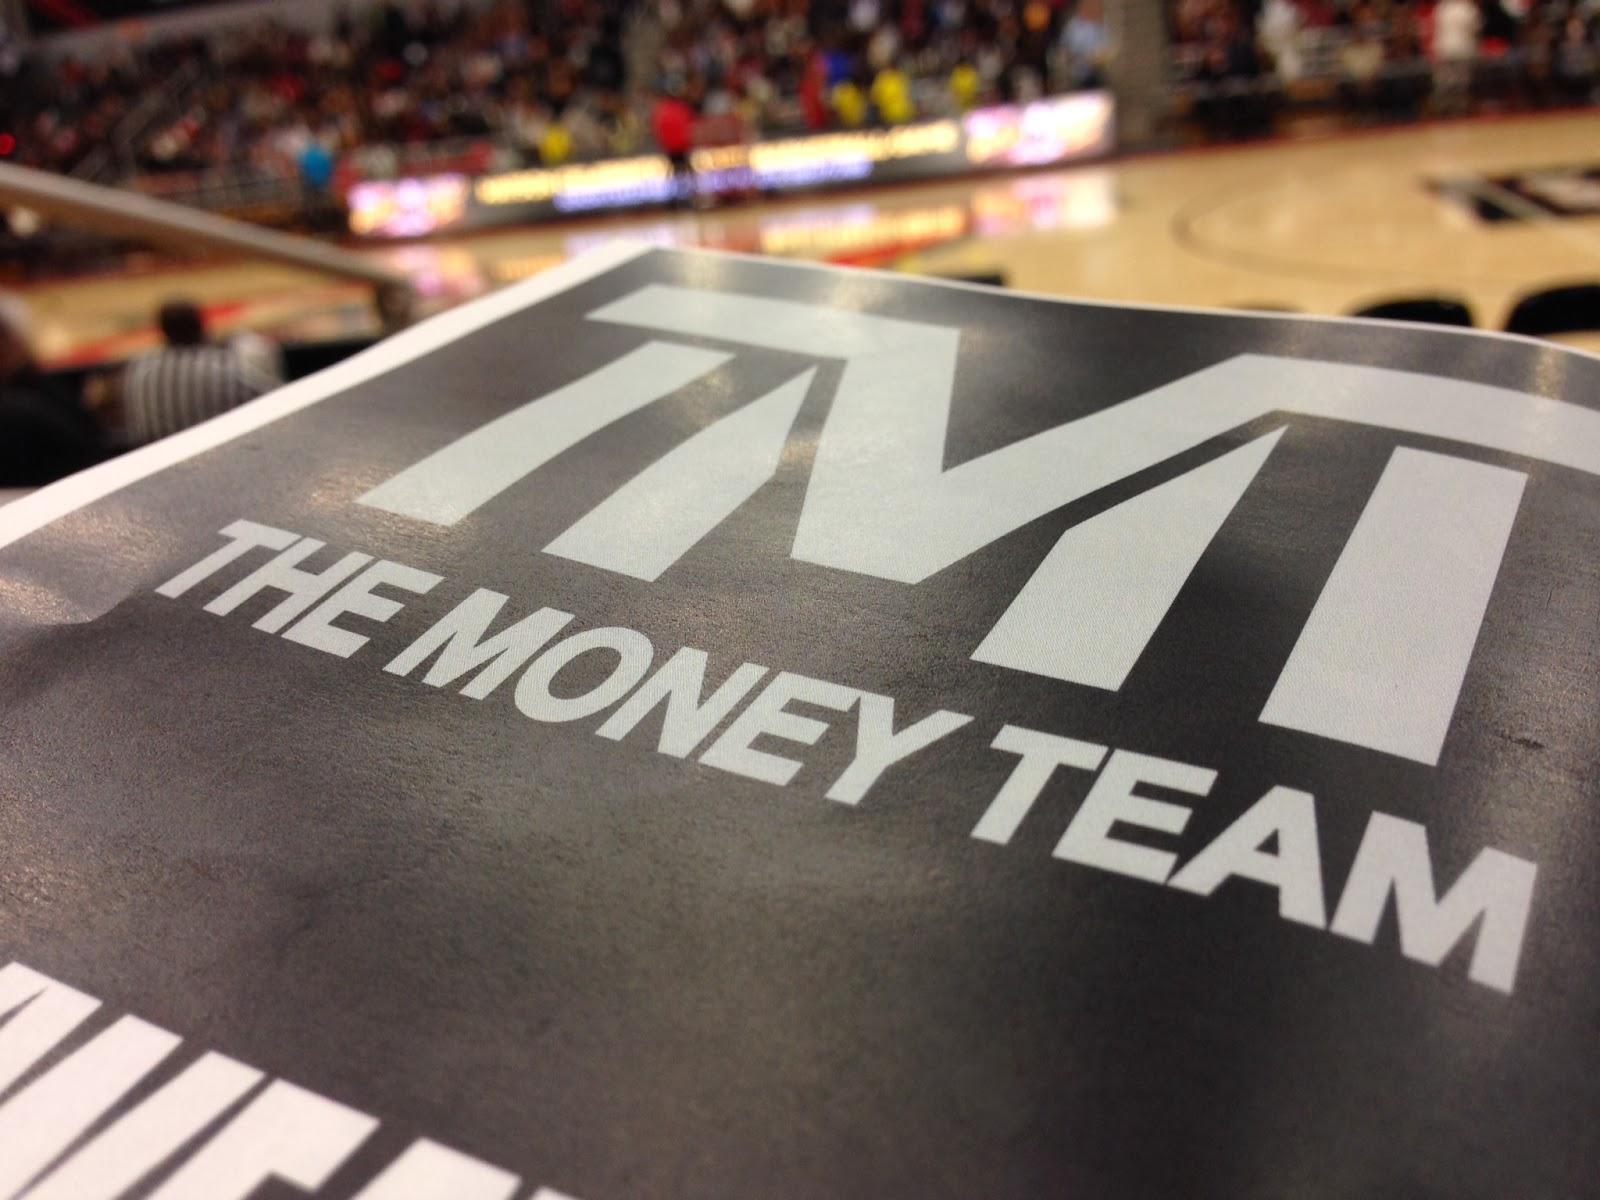 Floyd Mayweather Wallpaper Money Team The money team 1600x1200